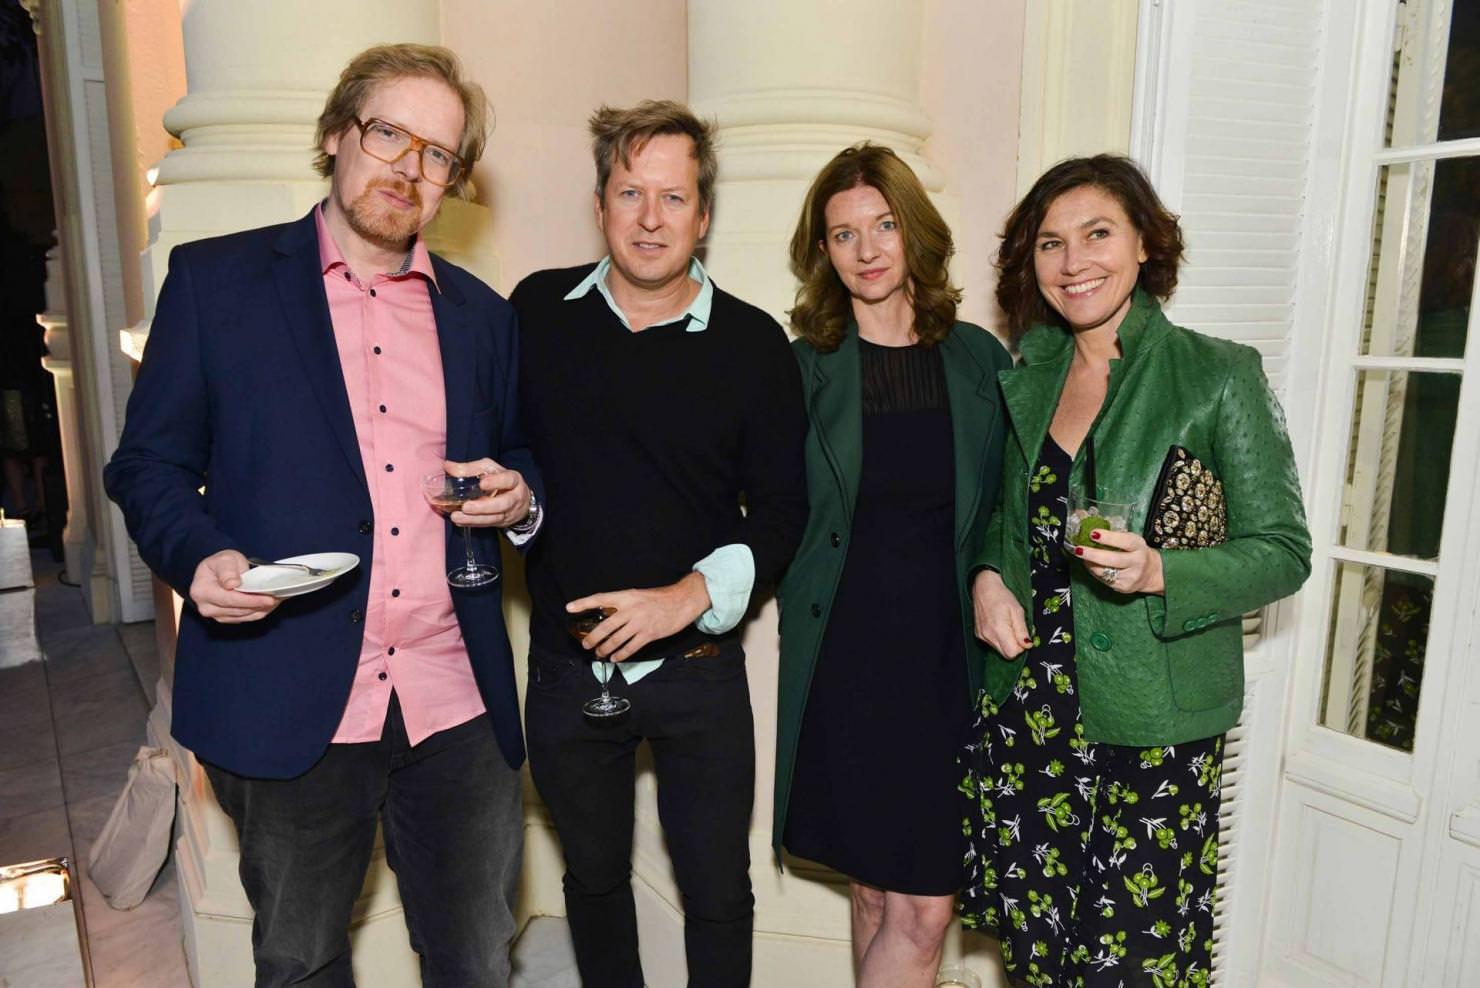 Jörg Heiser, Doug Aitken, Astrid Welter et Cristiana Perrella